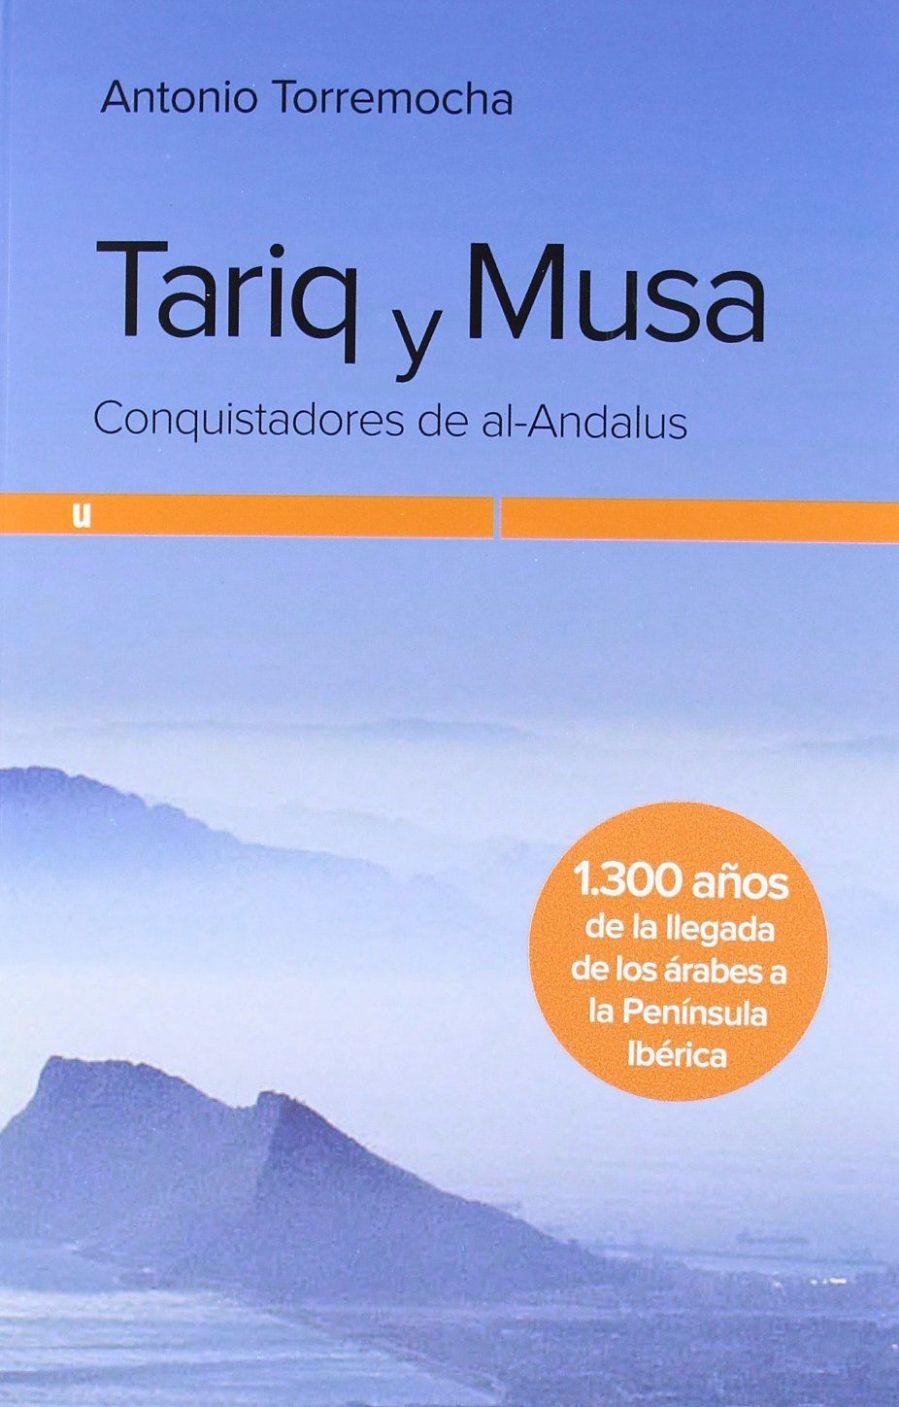 Tariq y Musa: Conquistadores de al-Andalus Book Cover